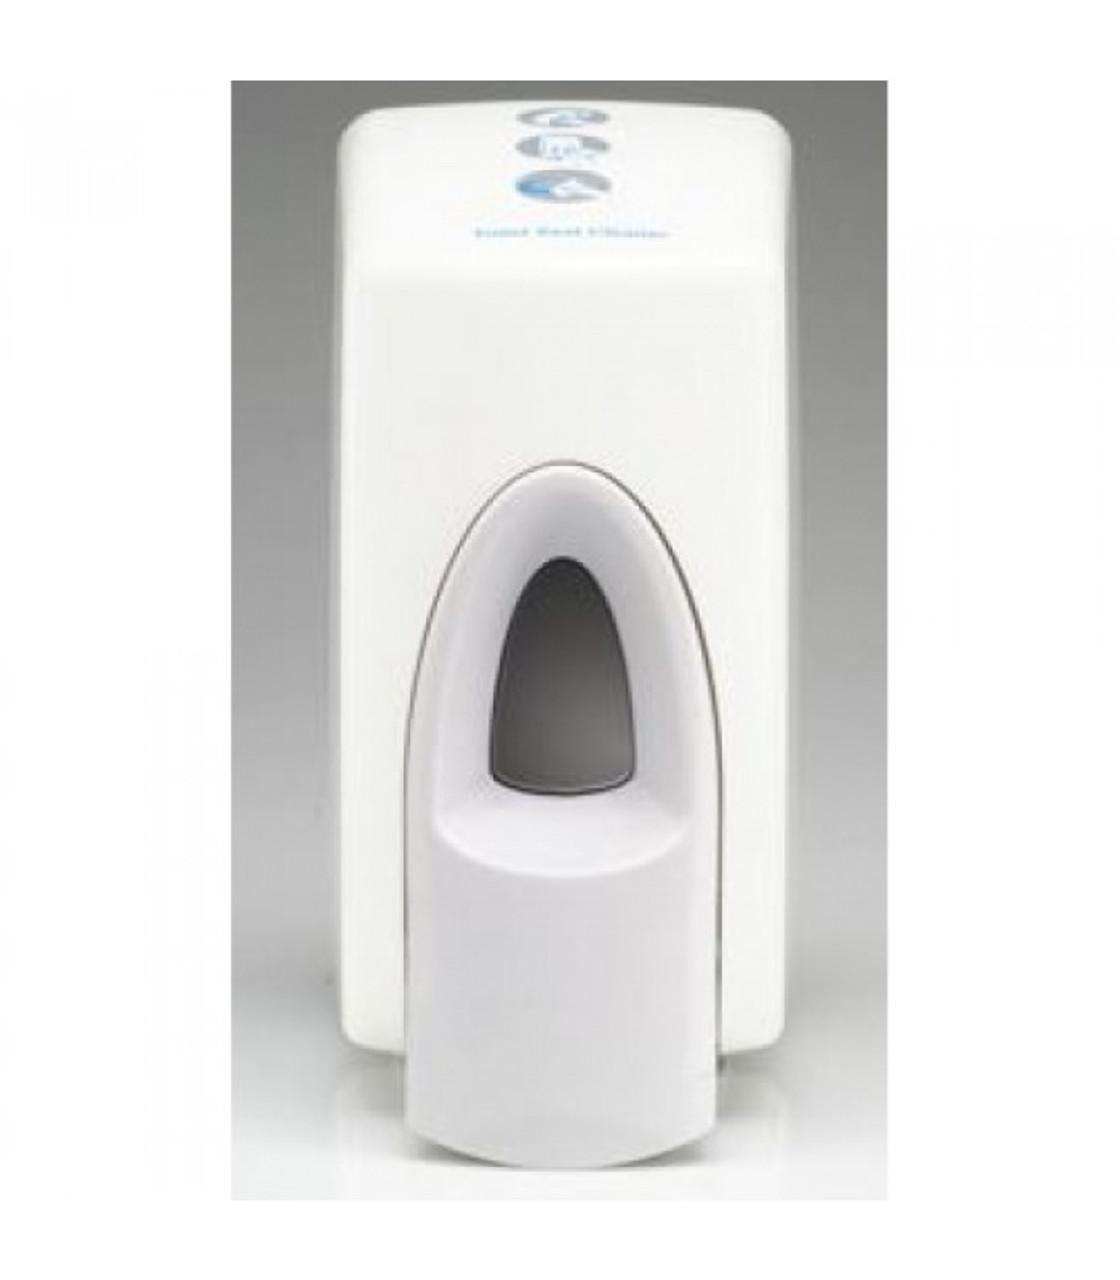 Rubbermaid 400ml Generic Spray Seat & Handle Cleaner Dispenser